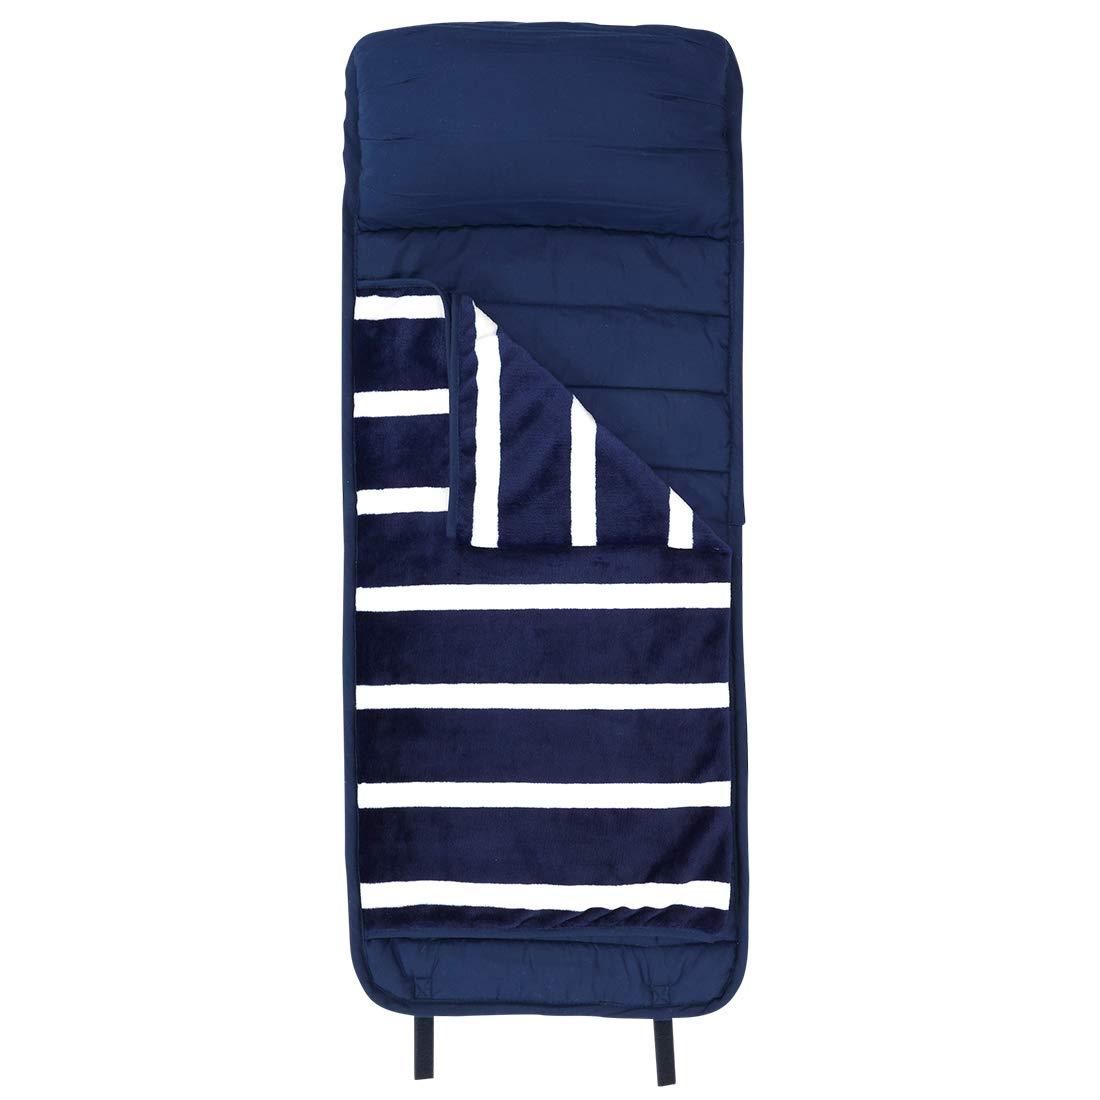 WB Nap Mat Navy Blue Stripe 47 x 18 Polyester Plush Fabric Slumber Sleeping Bag